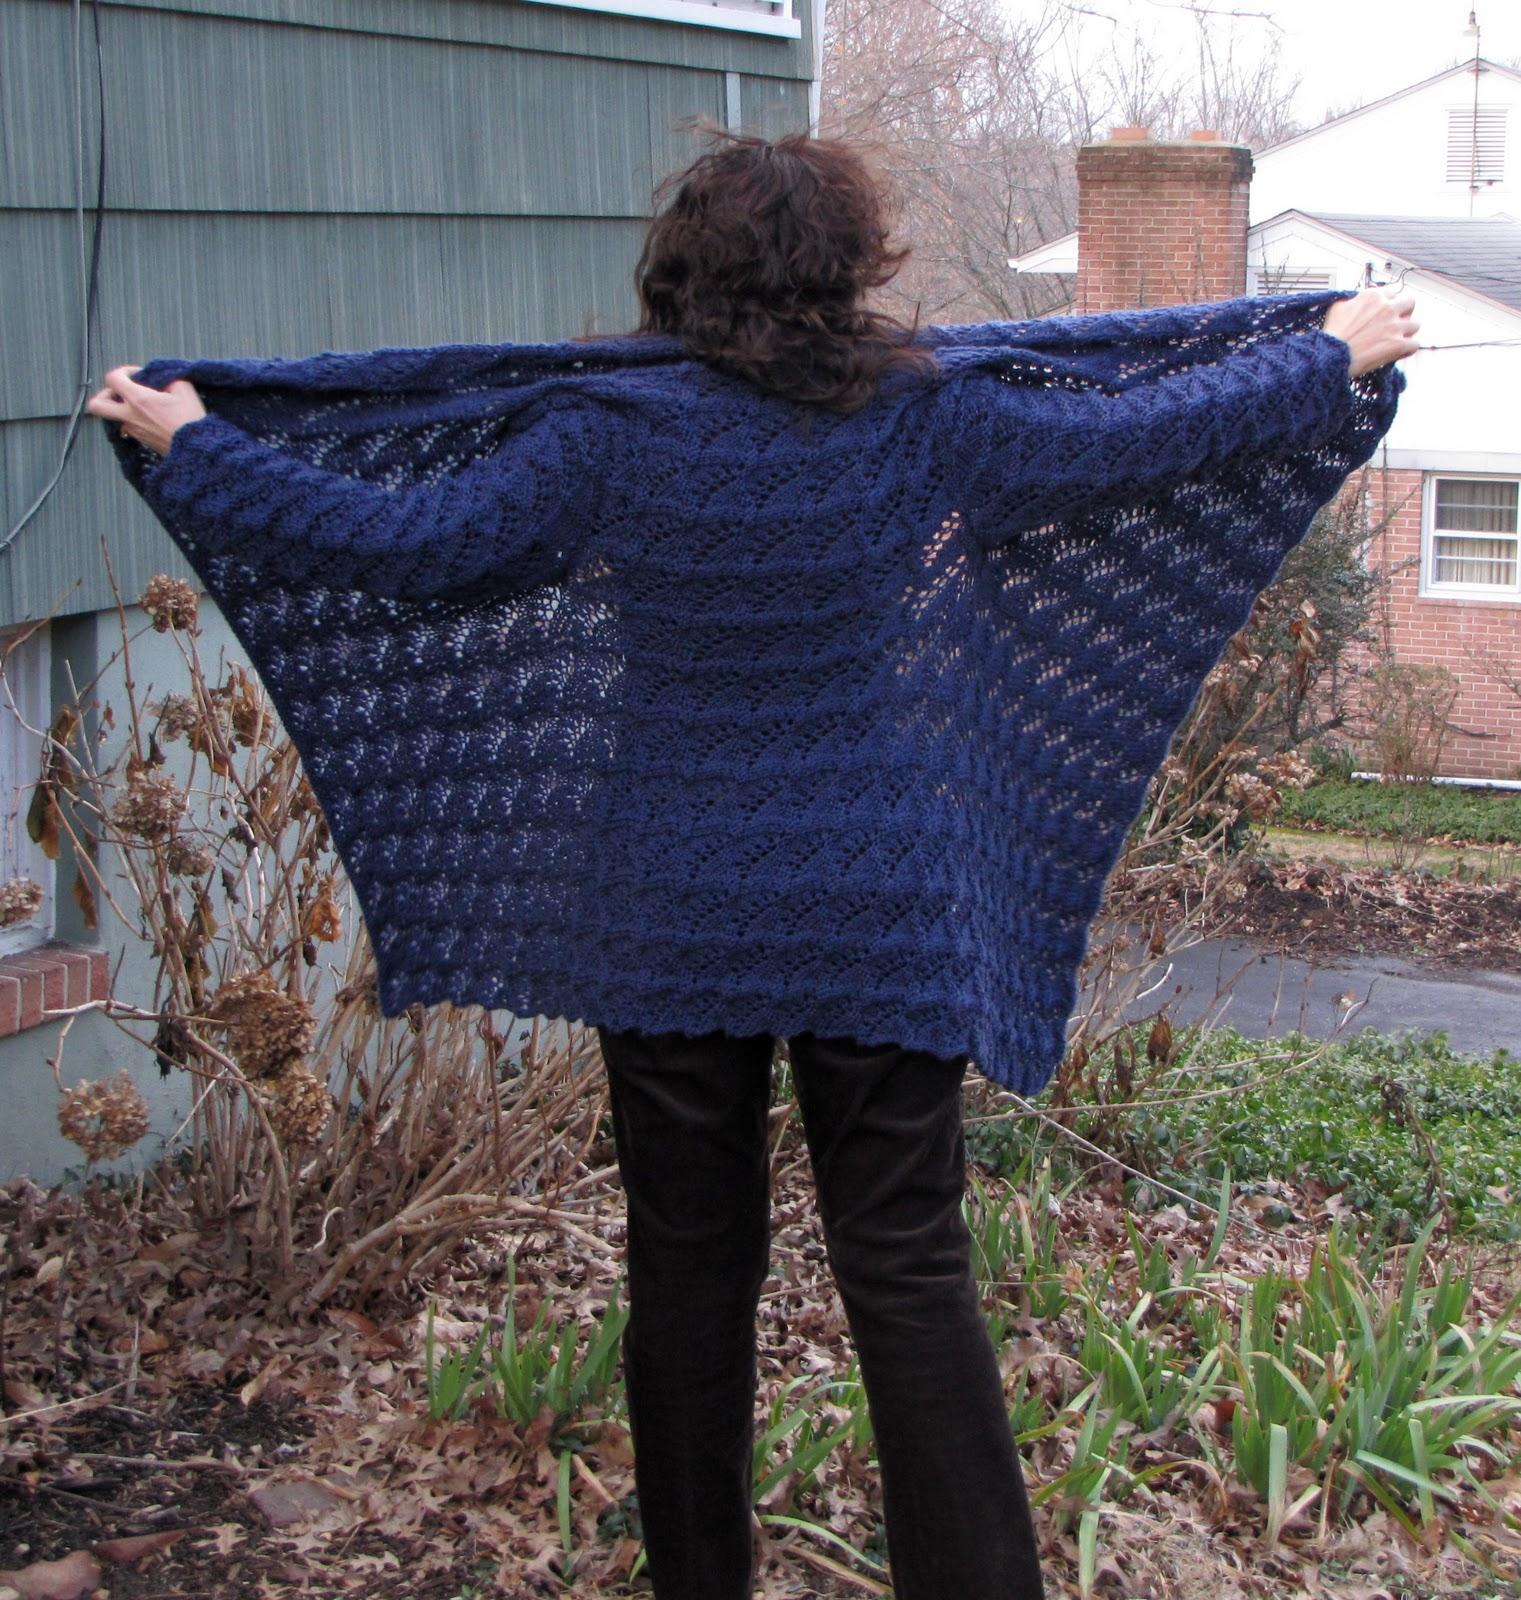 Knitting Pattern For Yoga Wrap : La Cubanita Cose: Vogue Knitting Winter 05/06 The Yoga Wrap